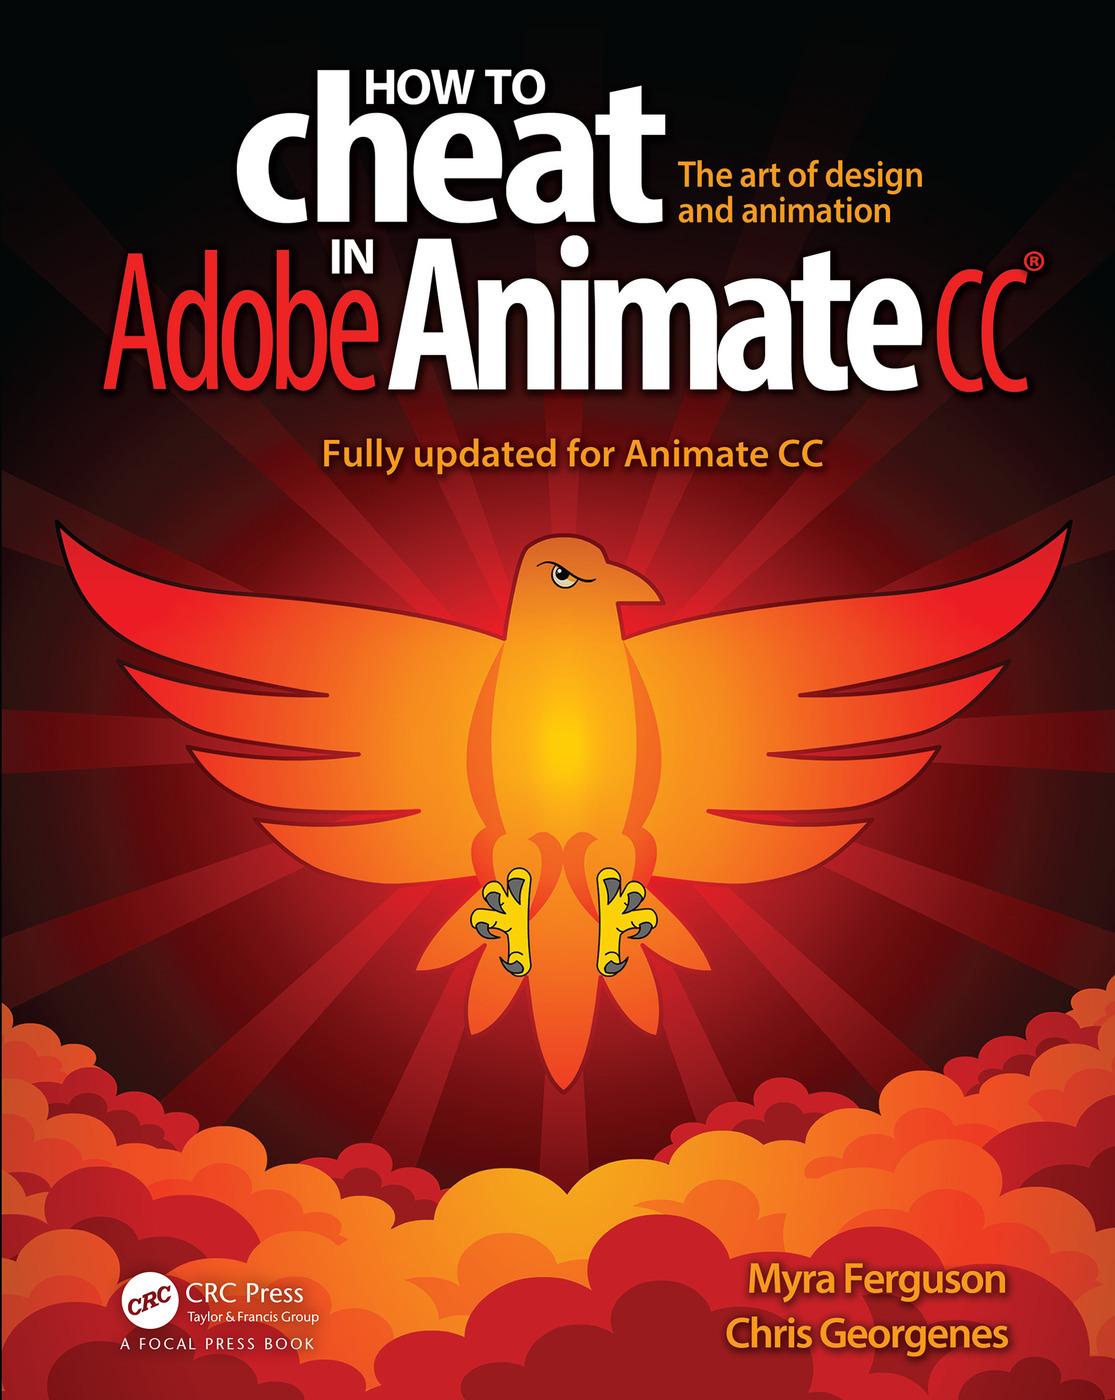 How To Cheat In Adobe Animate Cc 1st Edition Myra Ferguson Chri